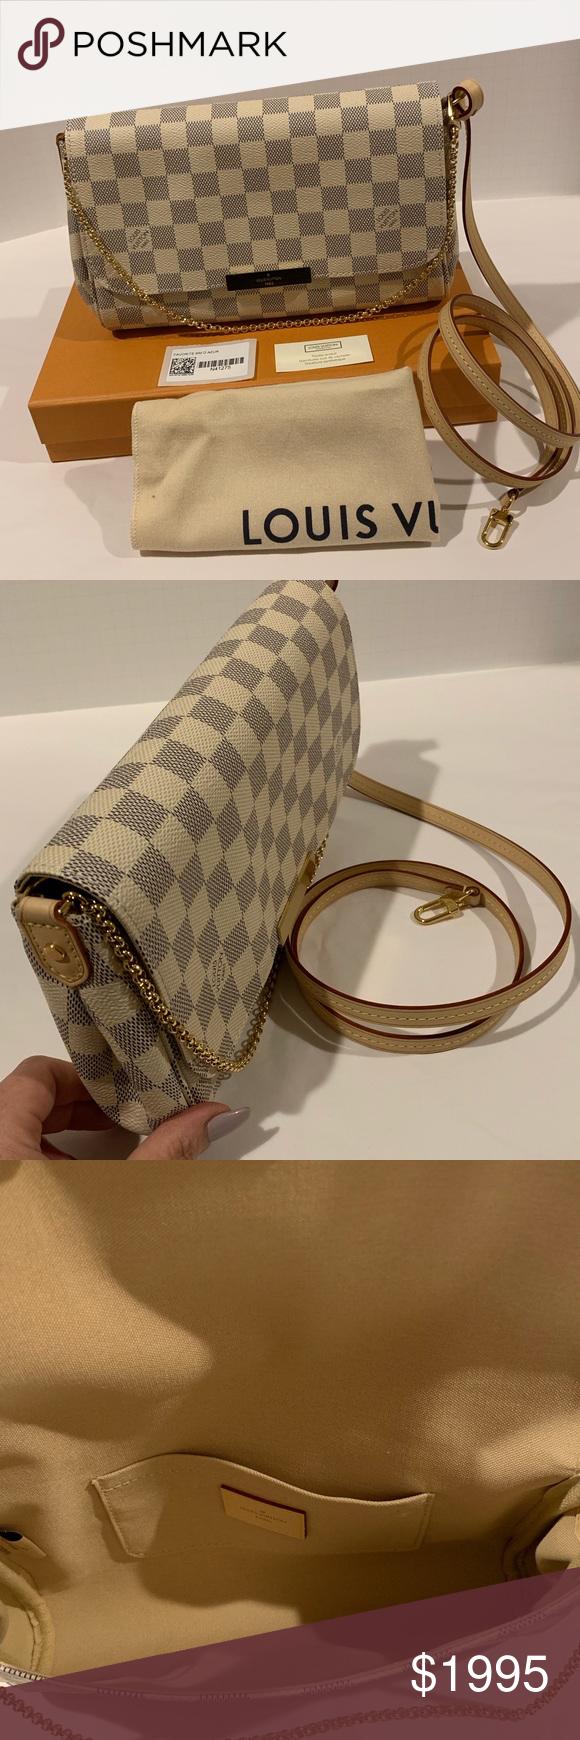 Sexy Louis Vuitton Clutch Nude Jpg